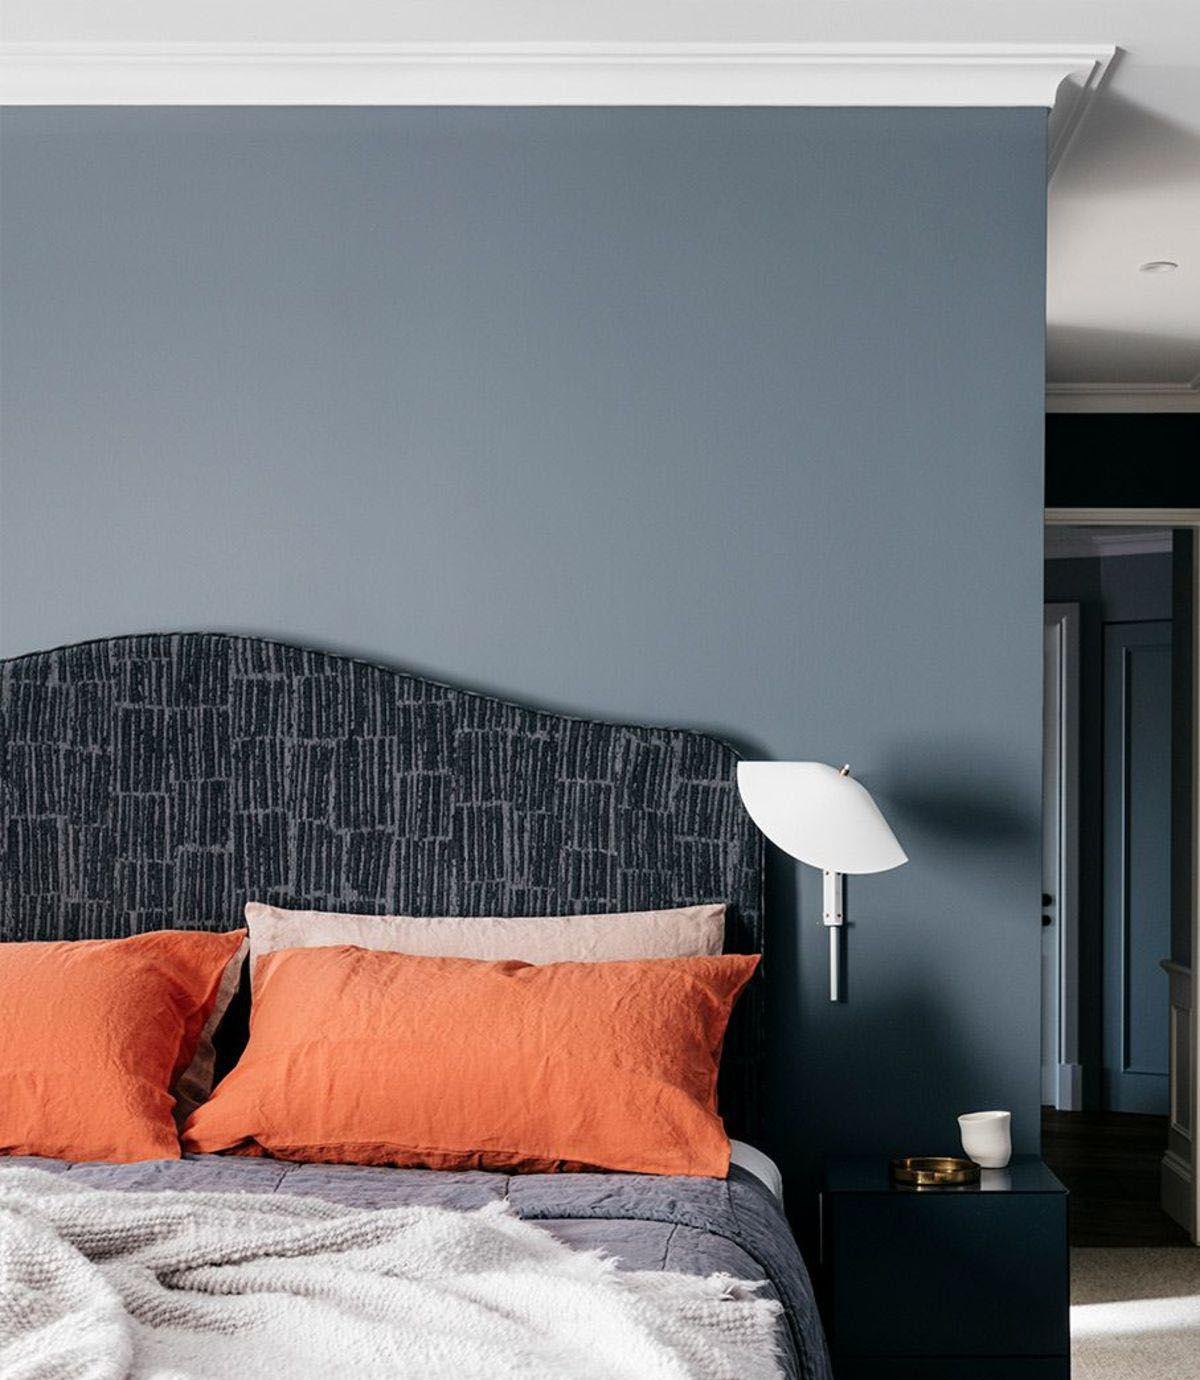 The 15 Best Bedroom Paint Colors That Aren T White In 2020 Modern Bedroom Decor Best Bedroom Paint Colors Stylish Bedroom Design